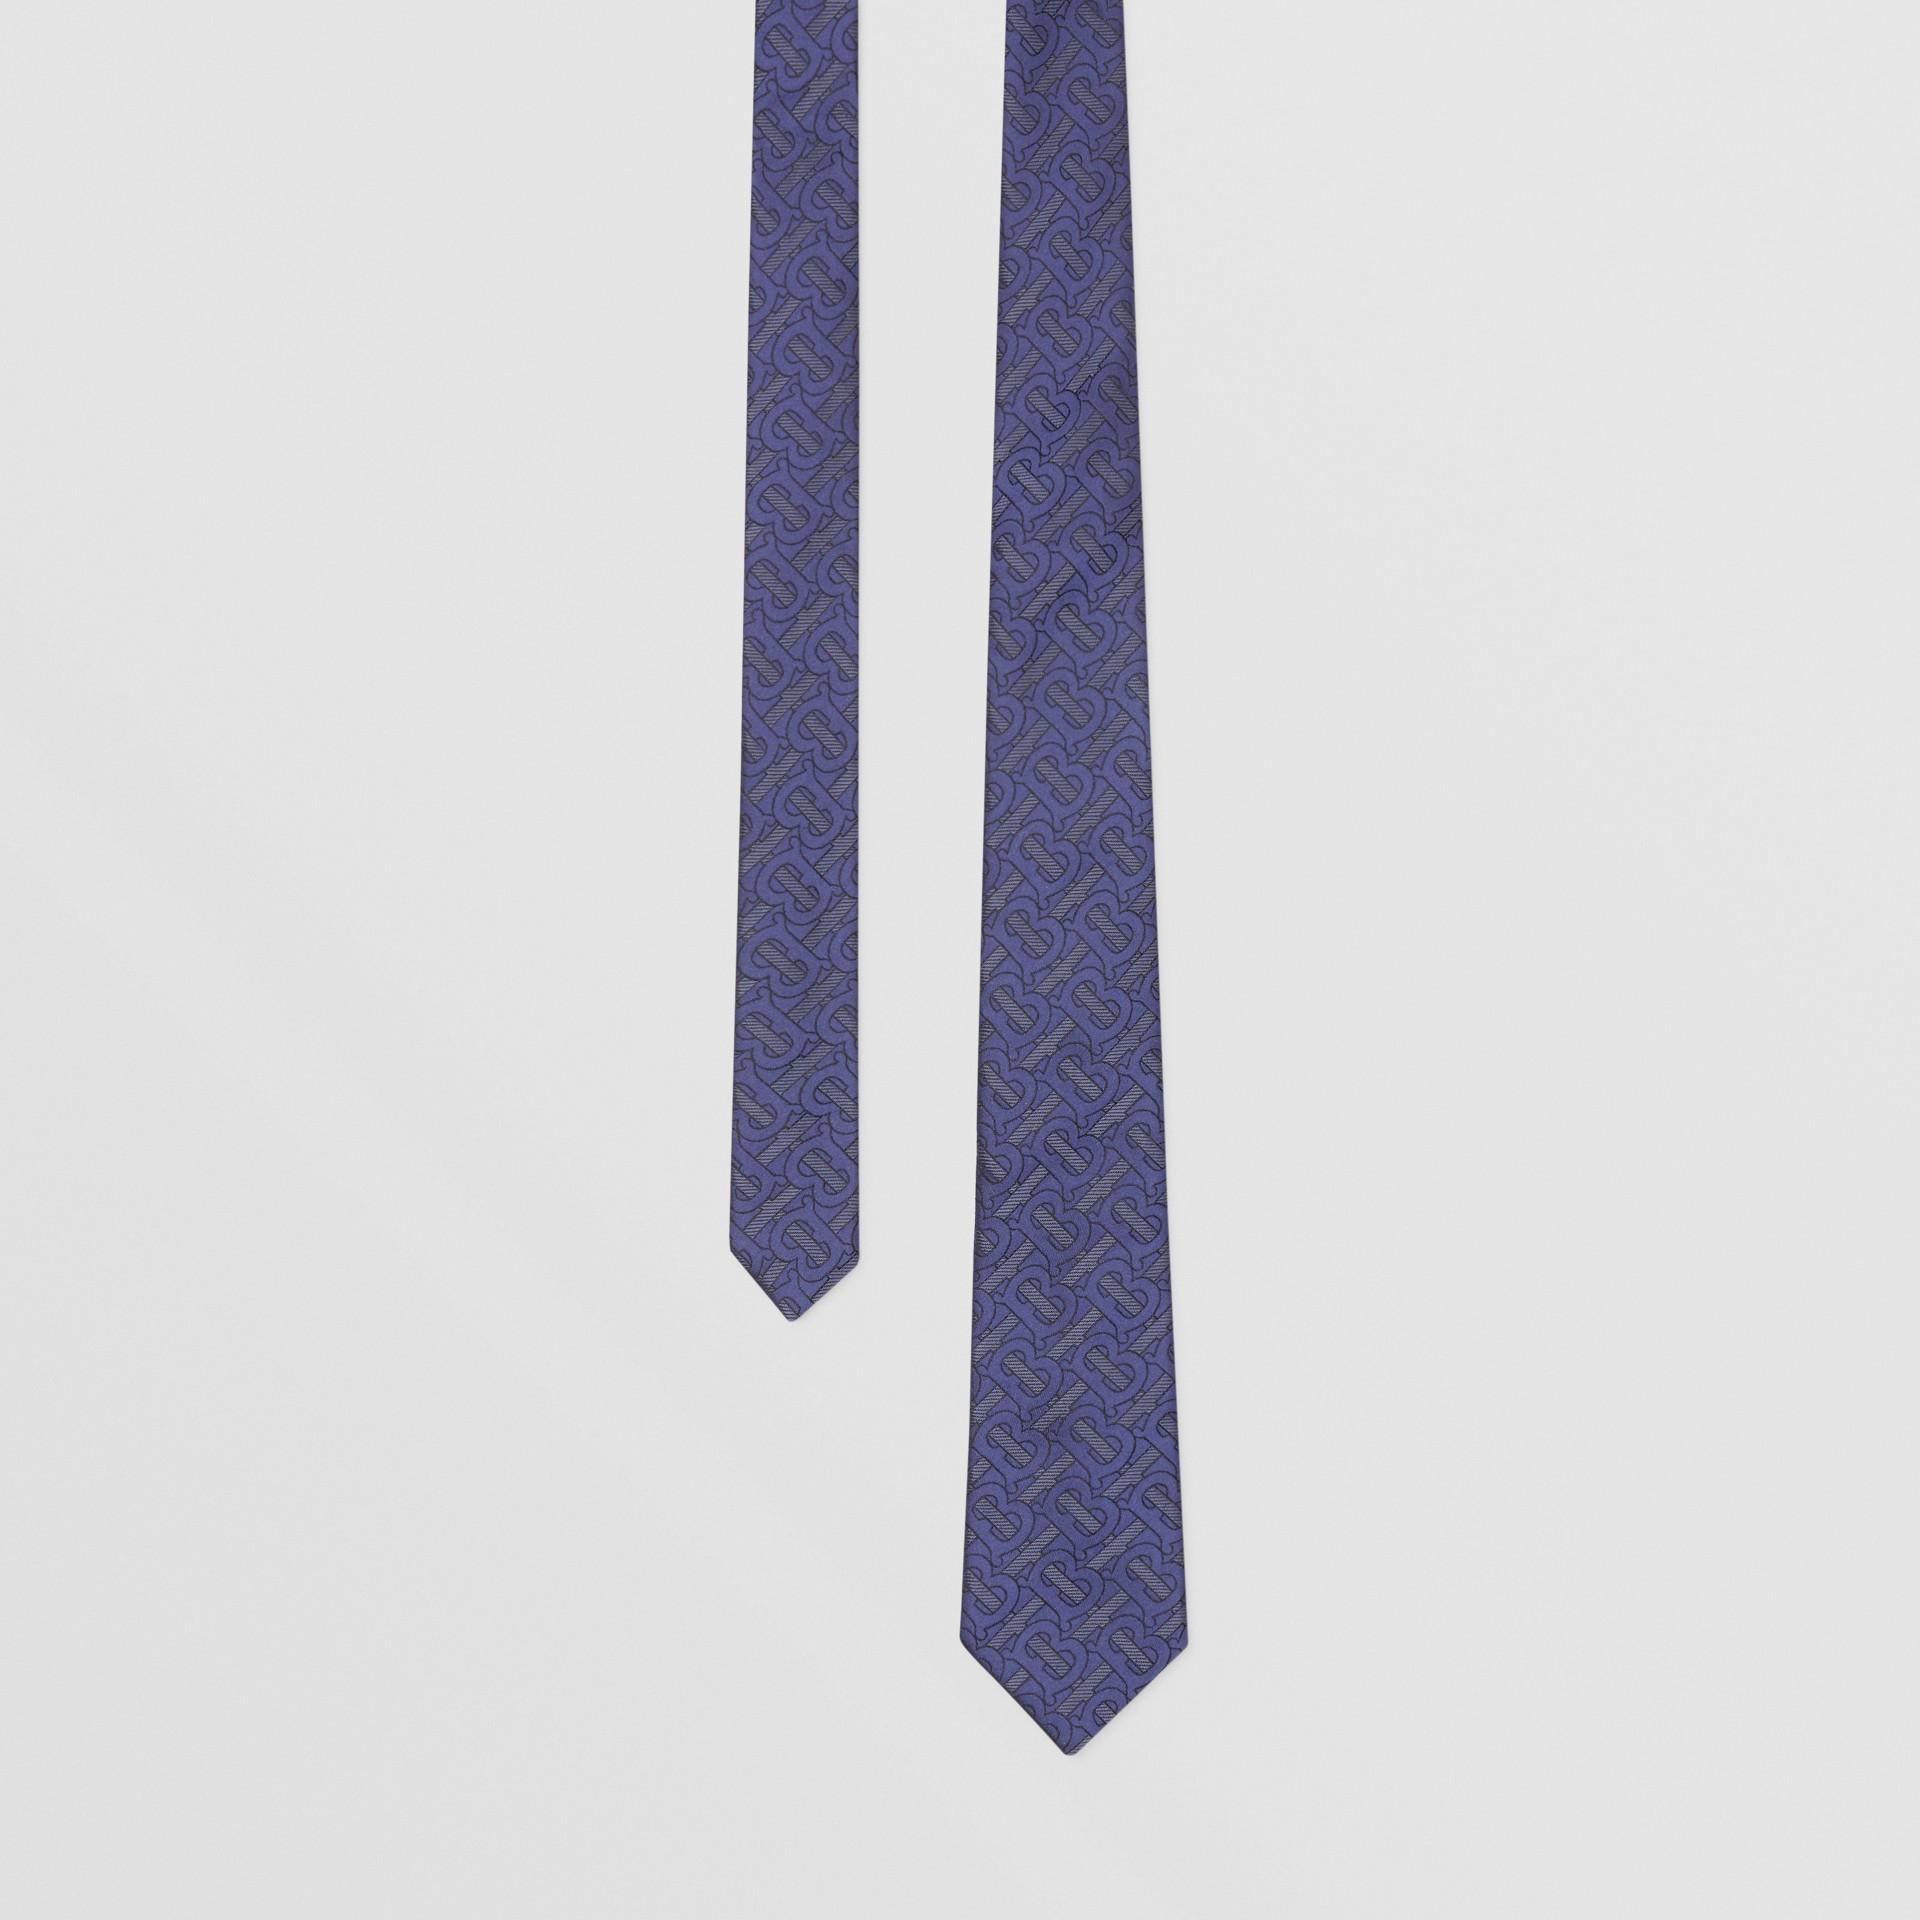 Classic Cut Monogram Silk Blend Jacquard Tie in Bright Indigo - Men | Burberry Hong Kong S.A.R - gallery image 0